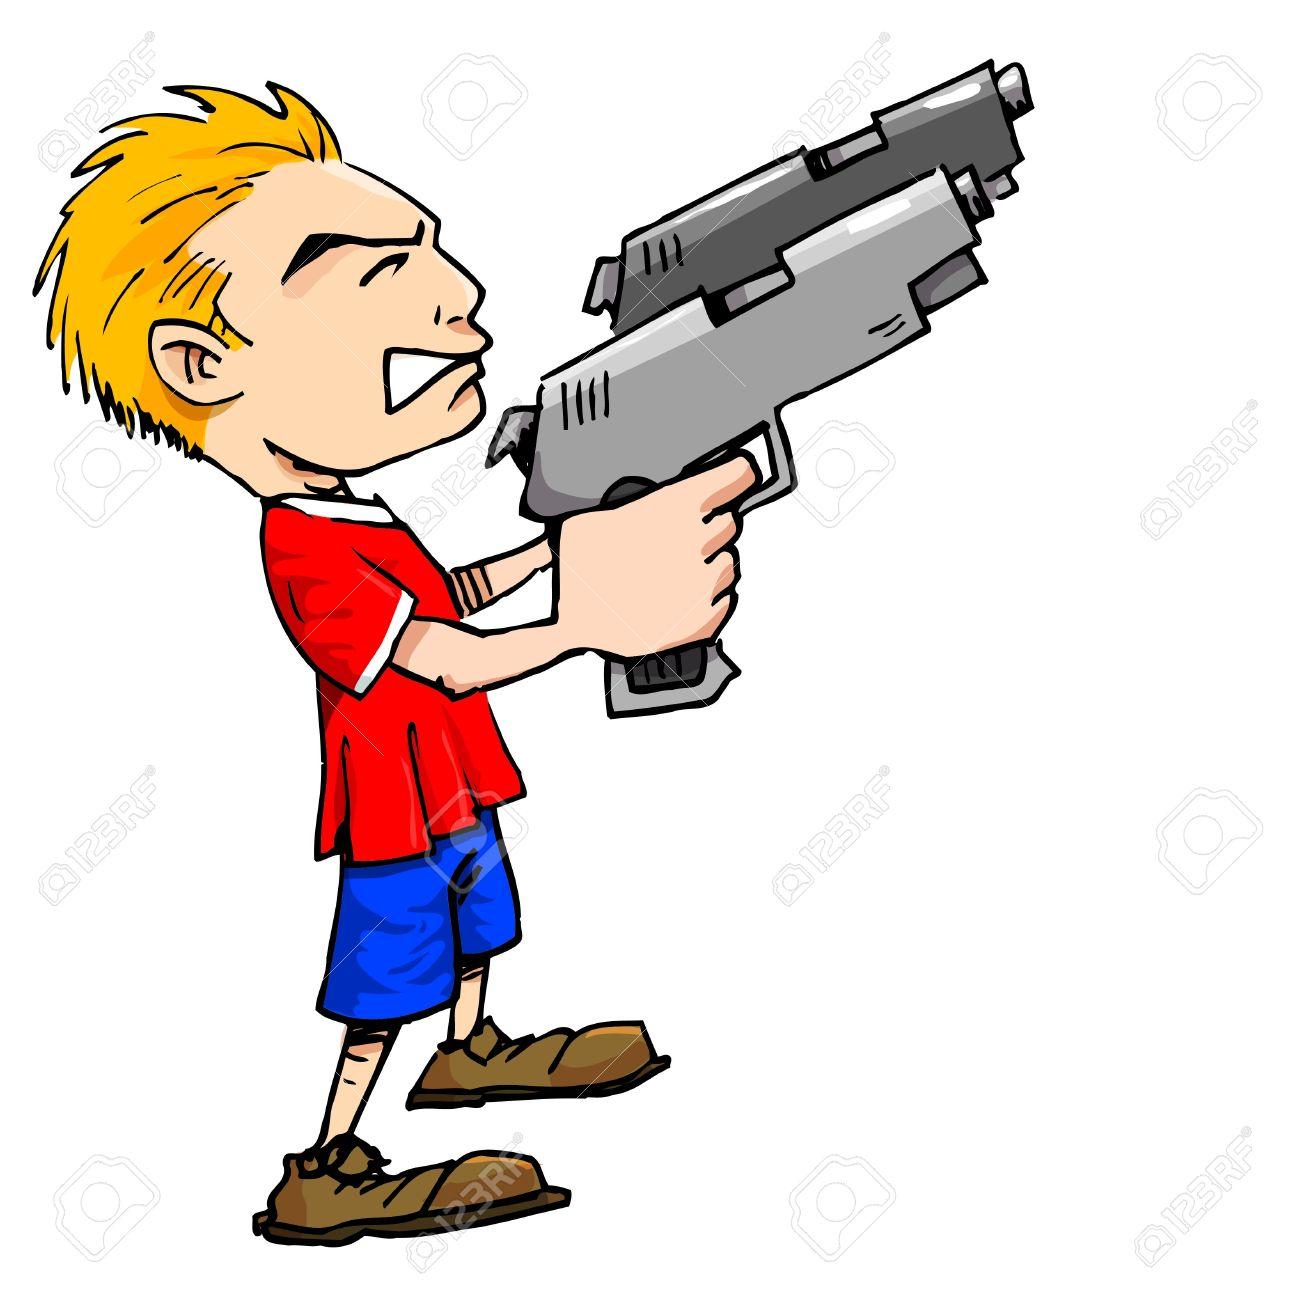 Cartoon Of Boy With Big Guns Royalty Free Cliparts, Vectors, And.